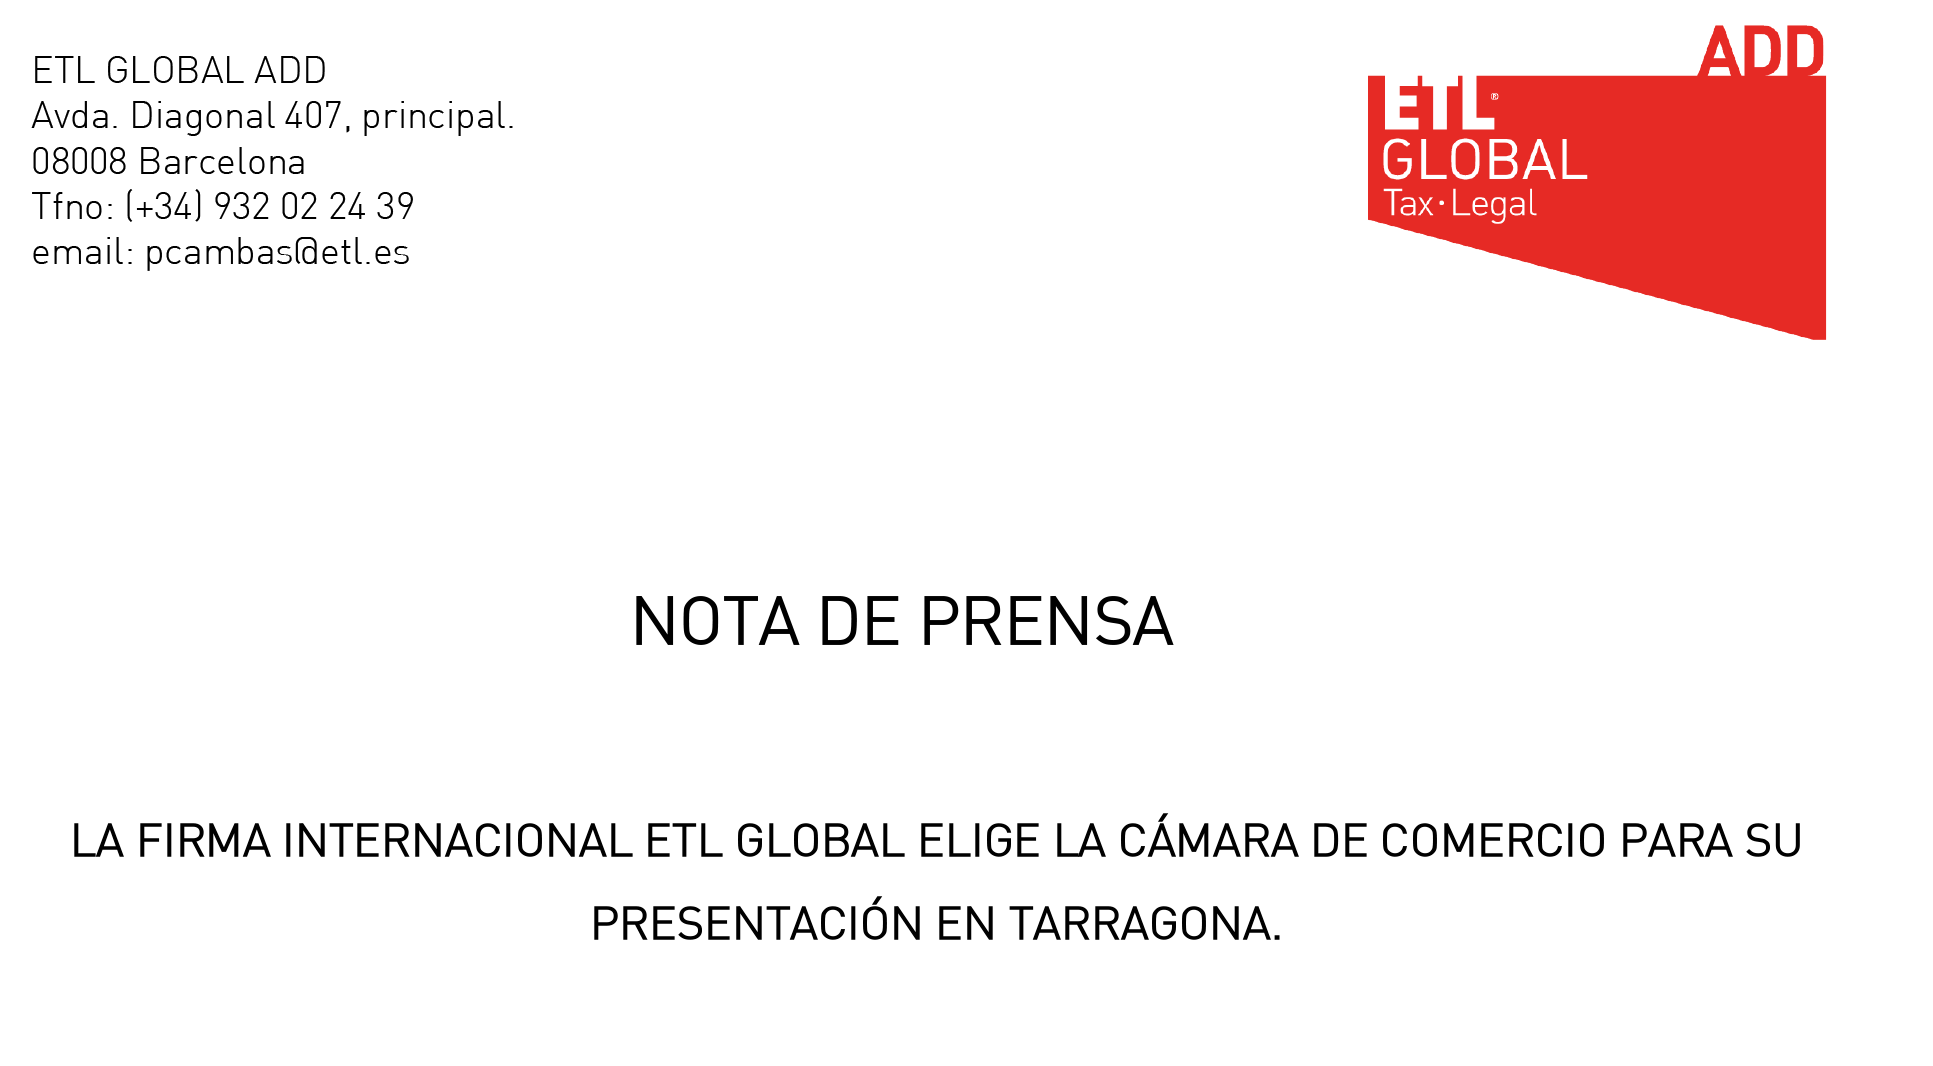 ETL GLOBAL SE PRESENTA EN TARRAGONA